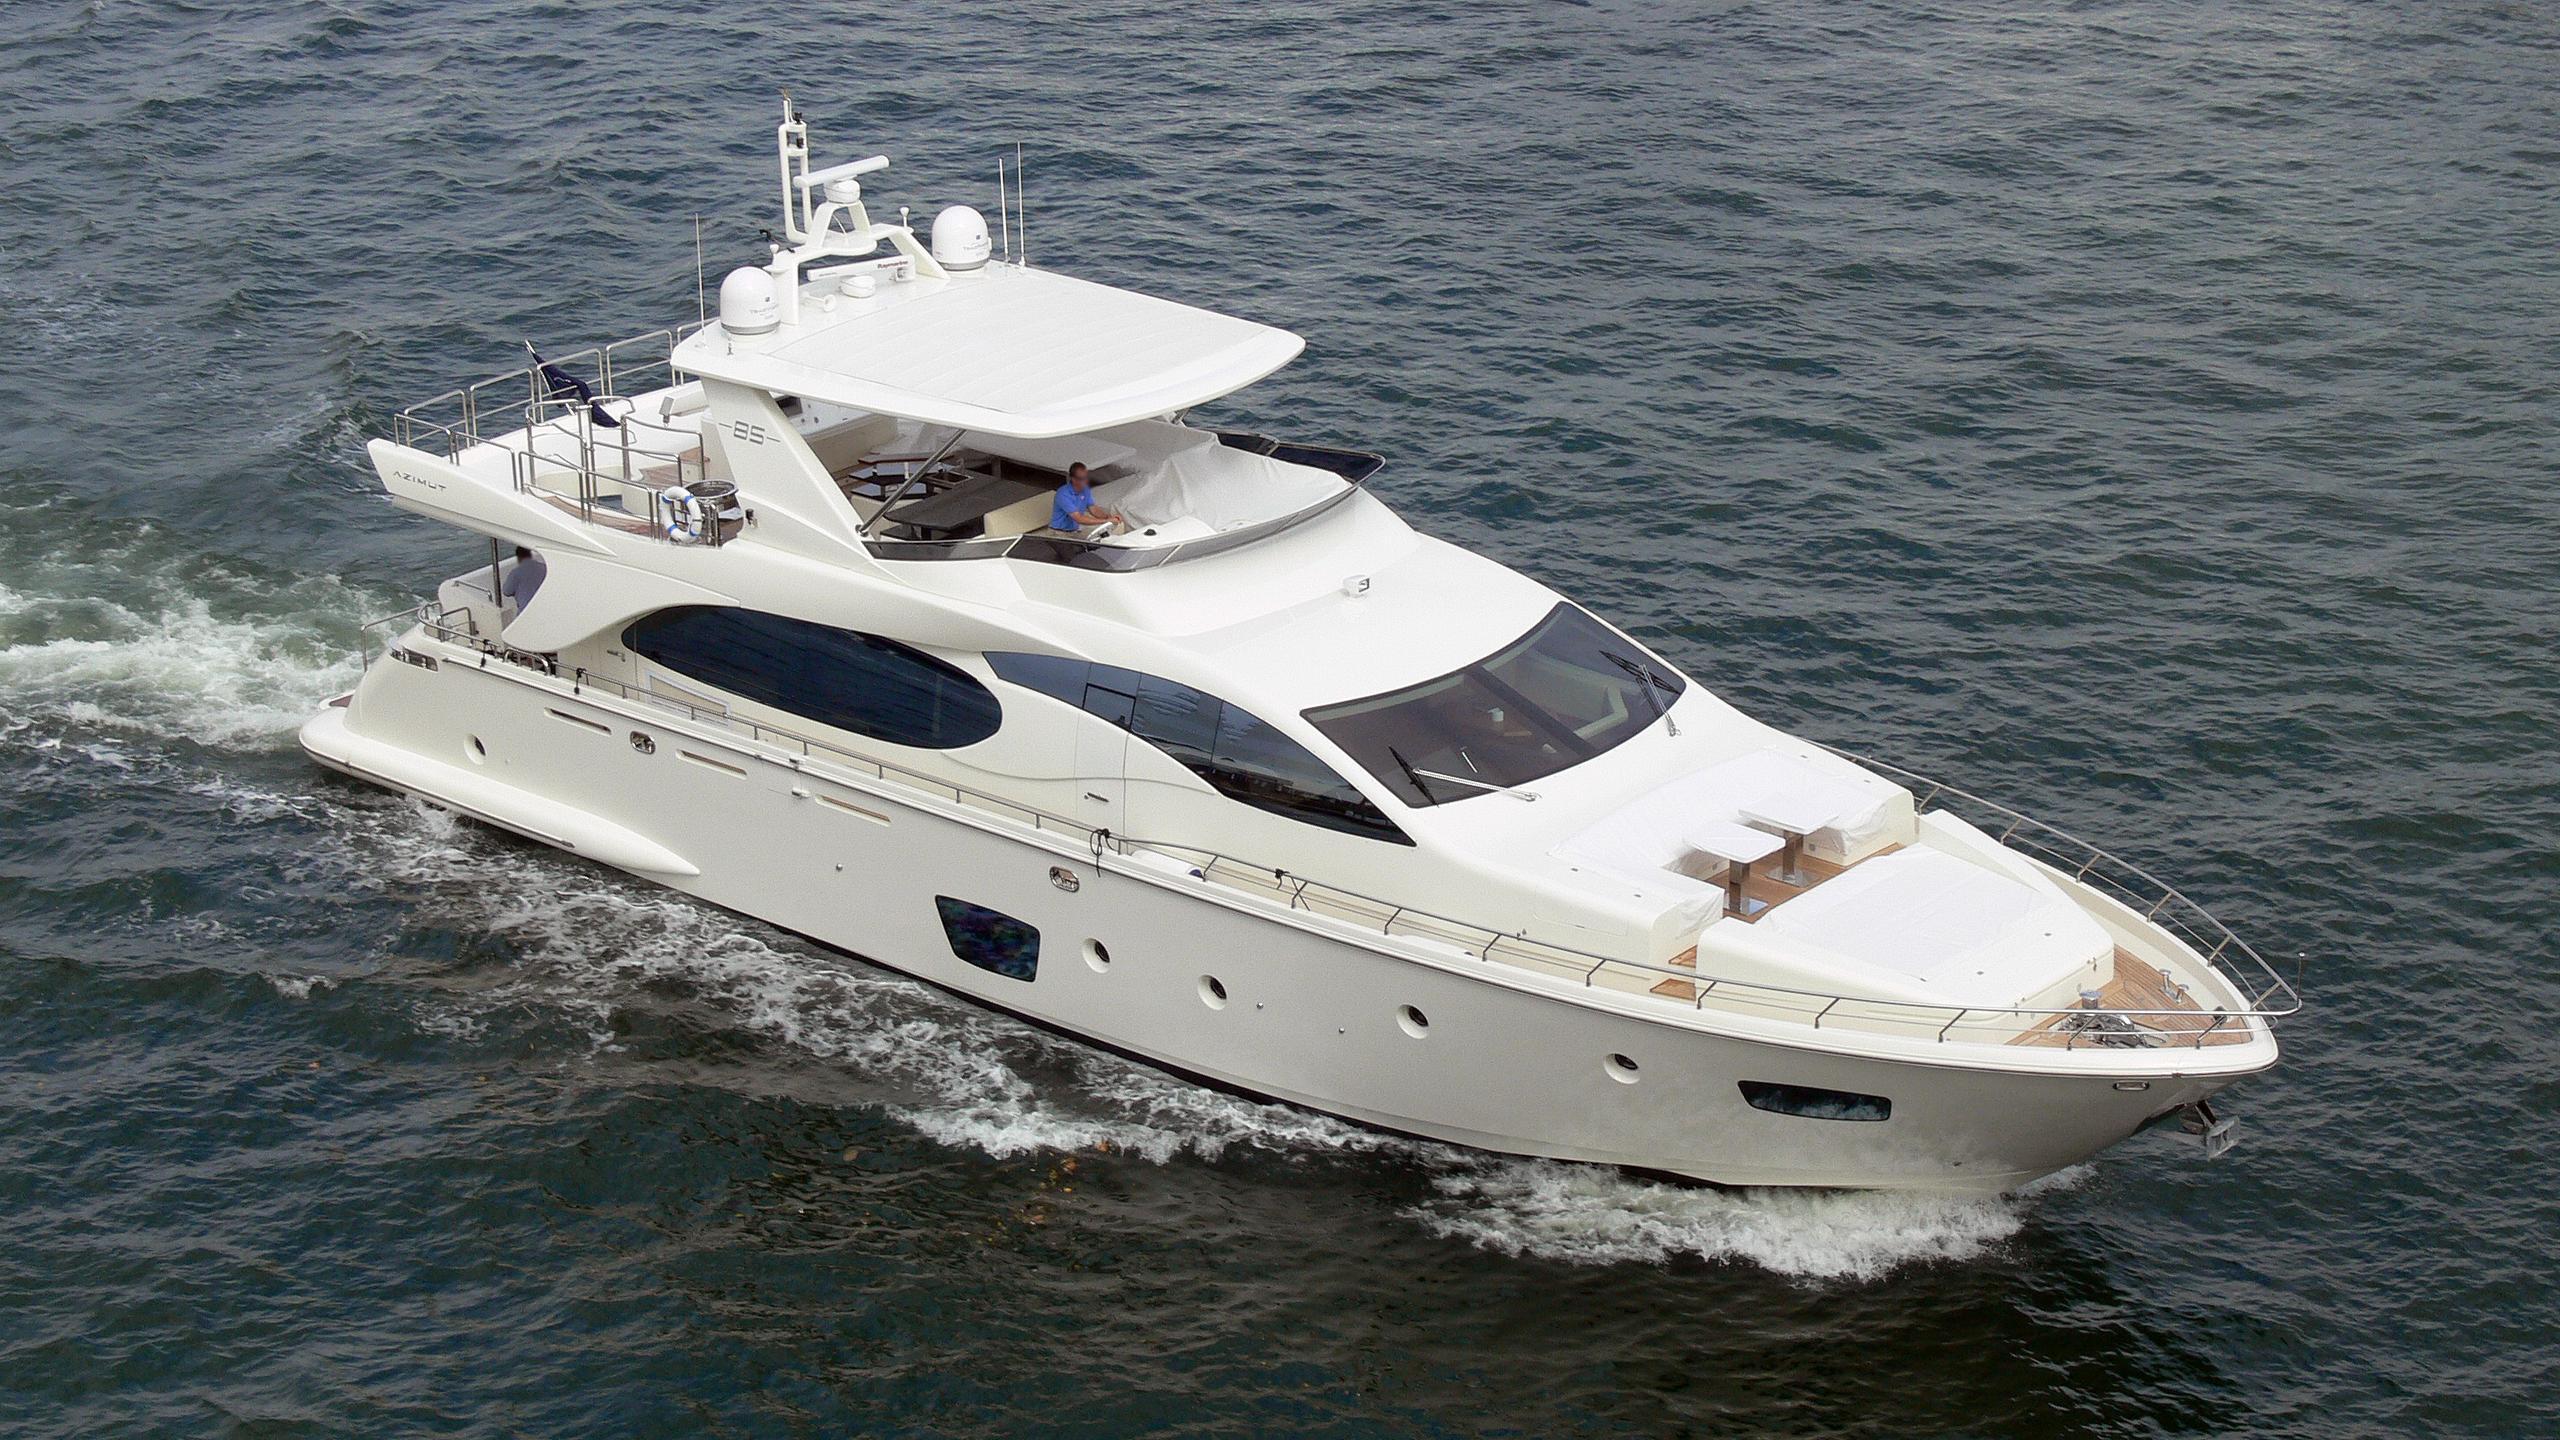 tropicana motoryacht azimut 85 2008 27m aerial sistership